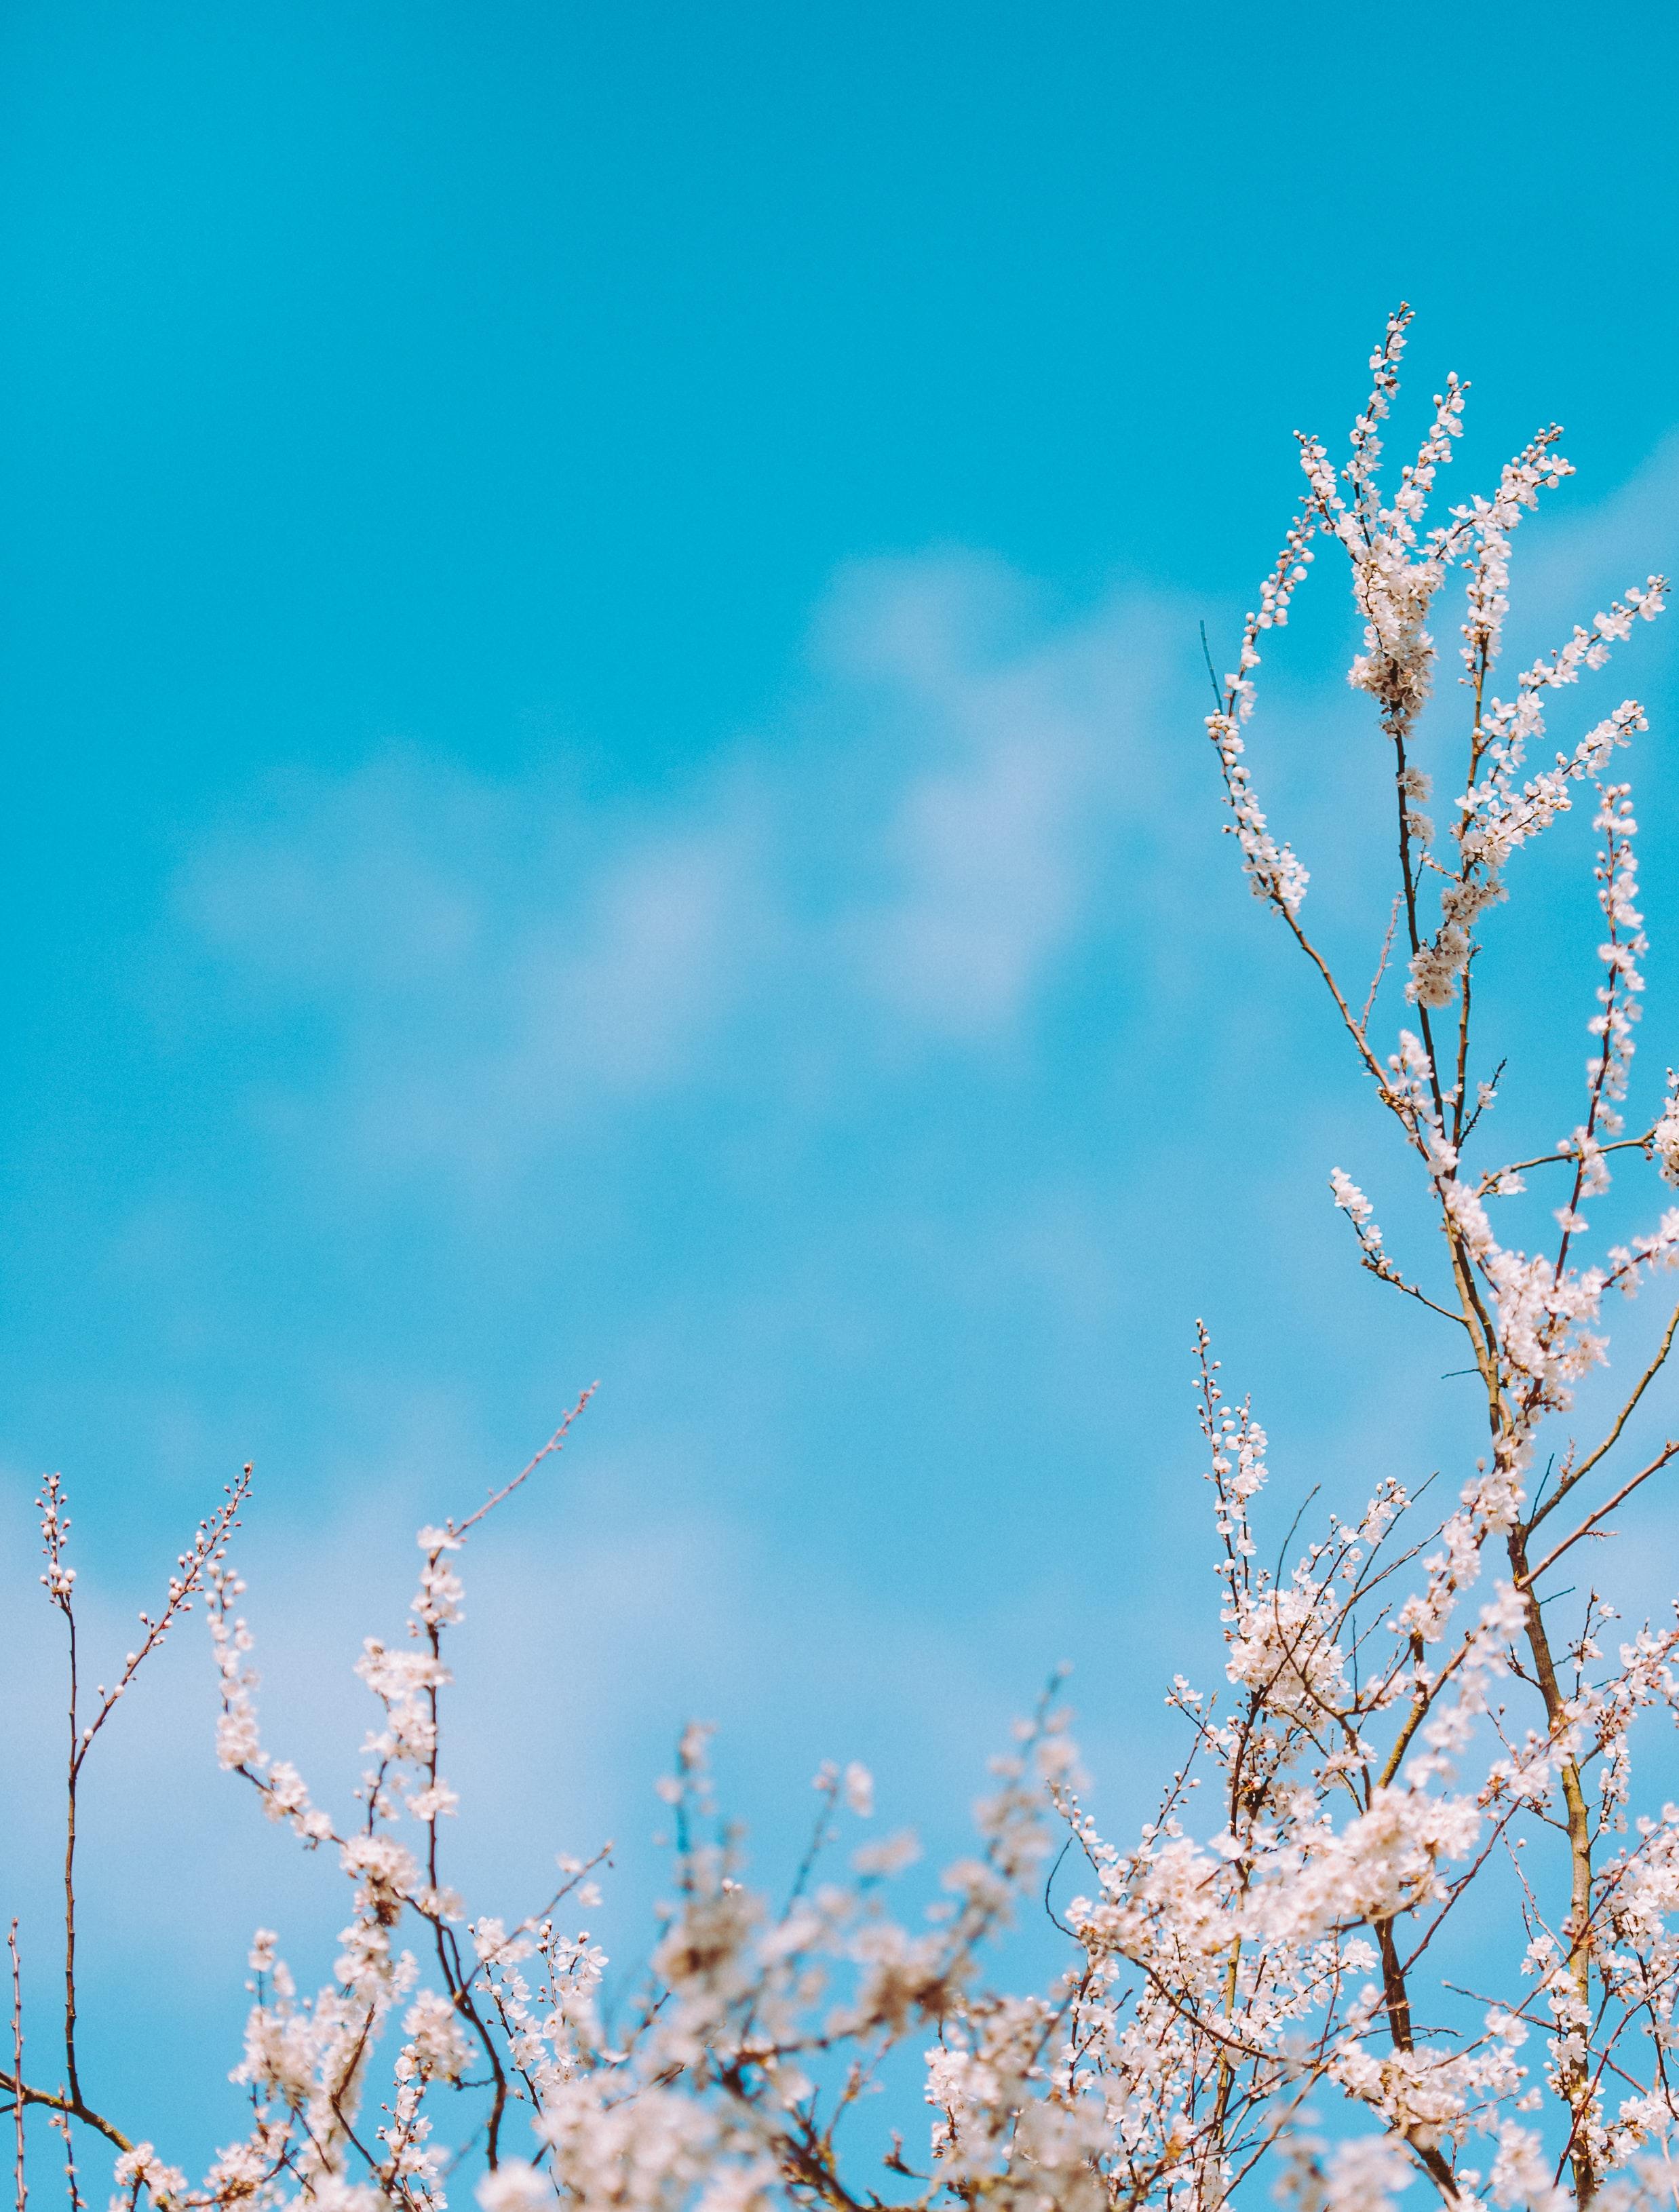 luân xa xanh dương